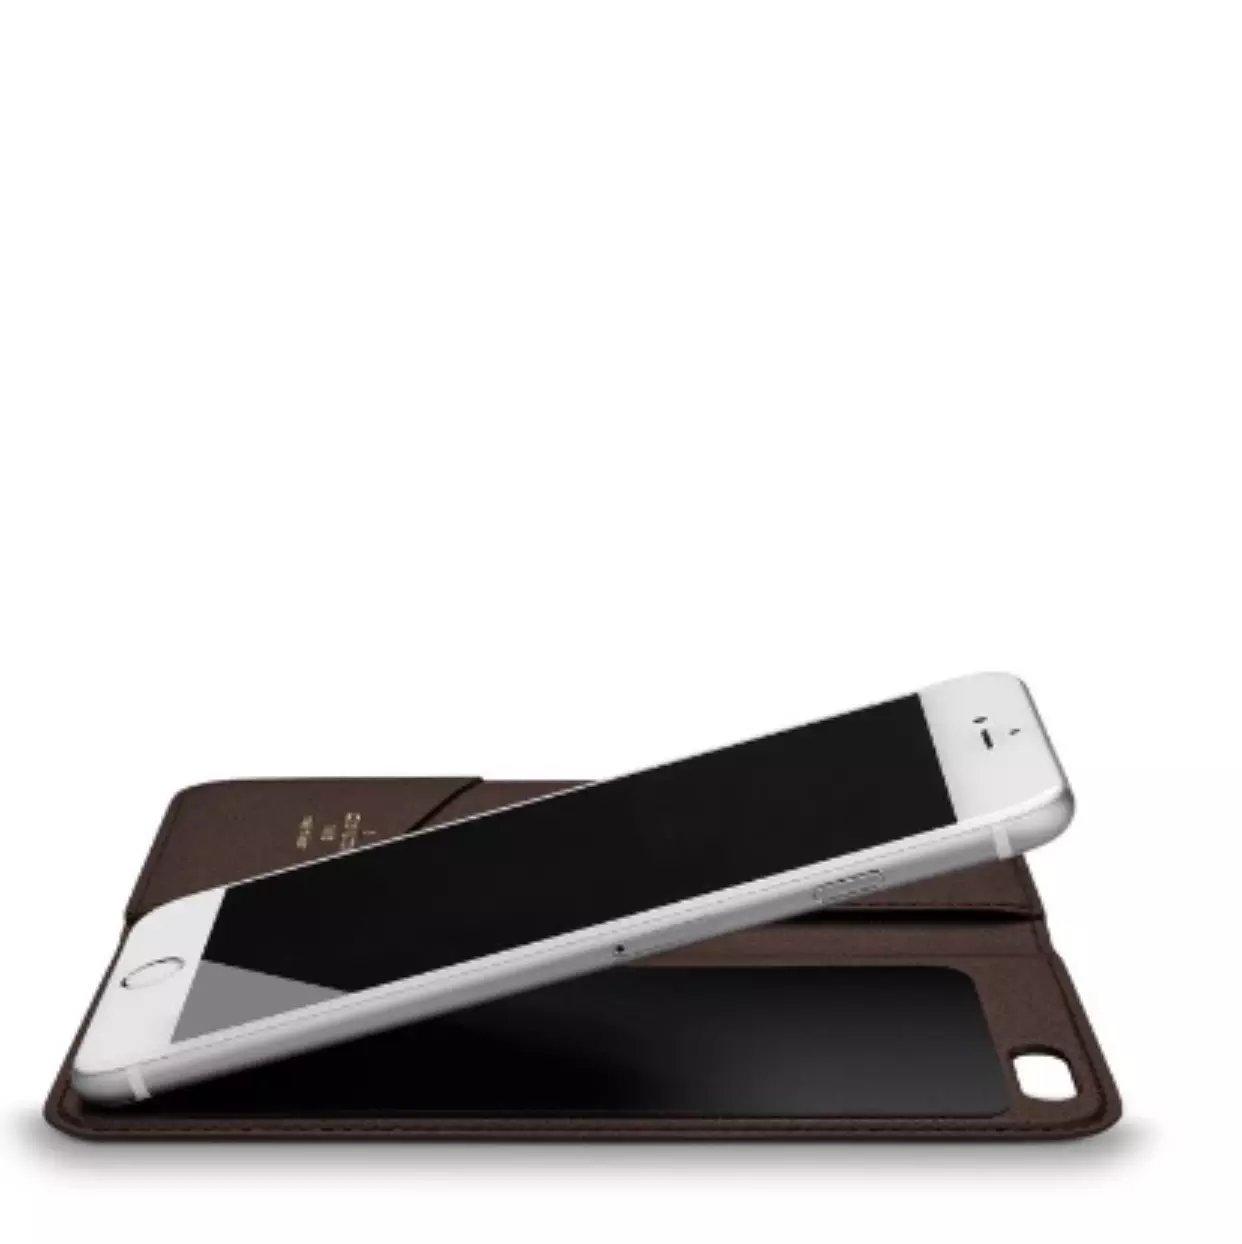 iphone case erstellen edle iphone hüllen Louis Vuitton iphone6s plus hülle handy ca6s foto iphone 6s Plus a6s elber gestalten iphone 6s Plus hülle erstellen foto cover handy wann kommt der neue iphone erfahrungen mit iphone 6s Plus